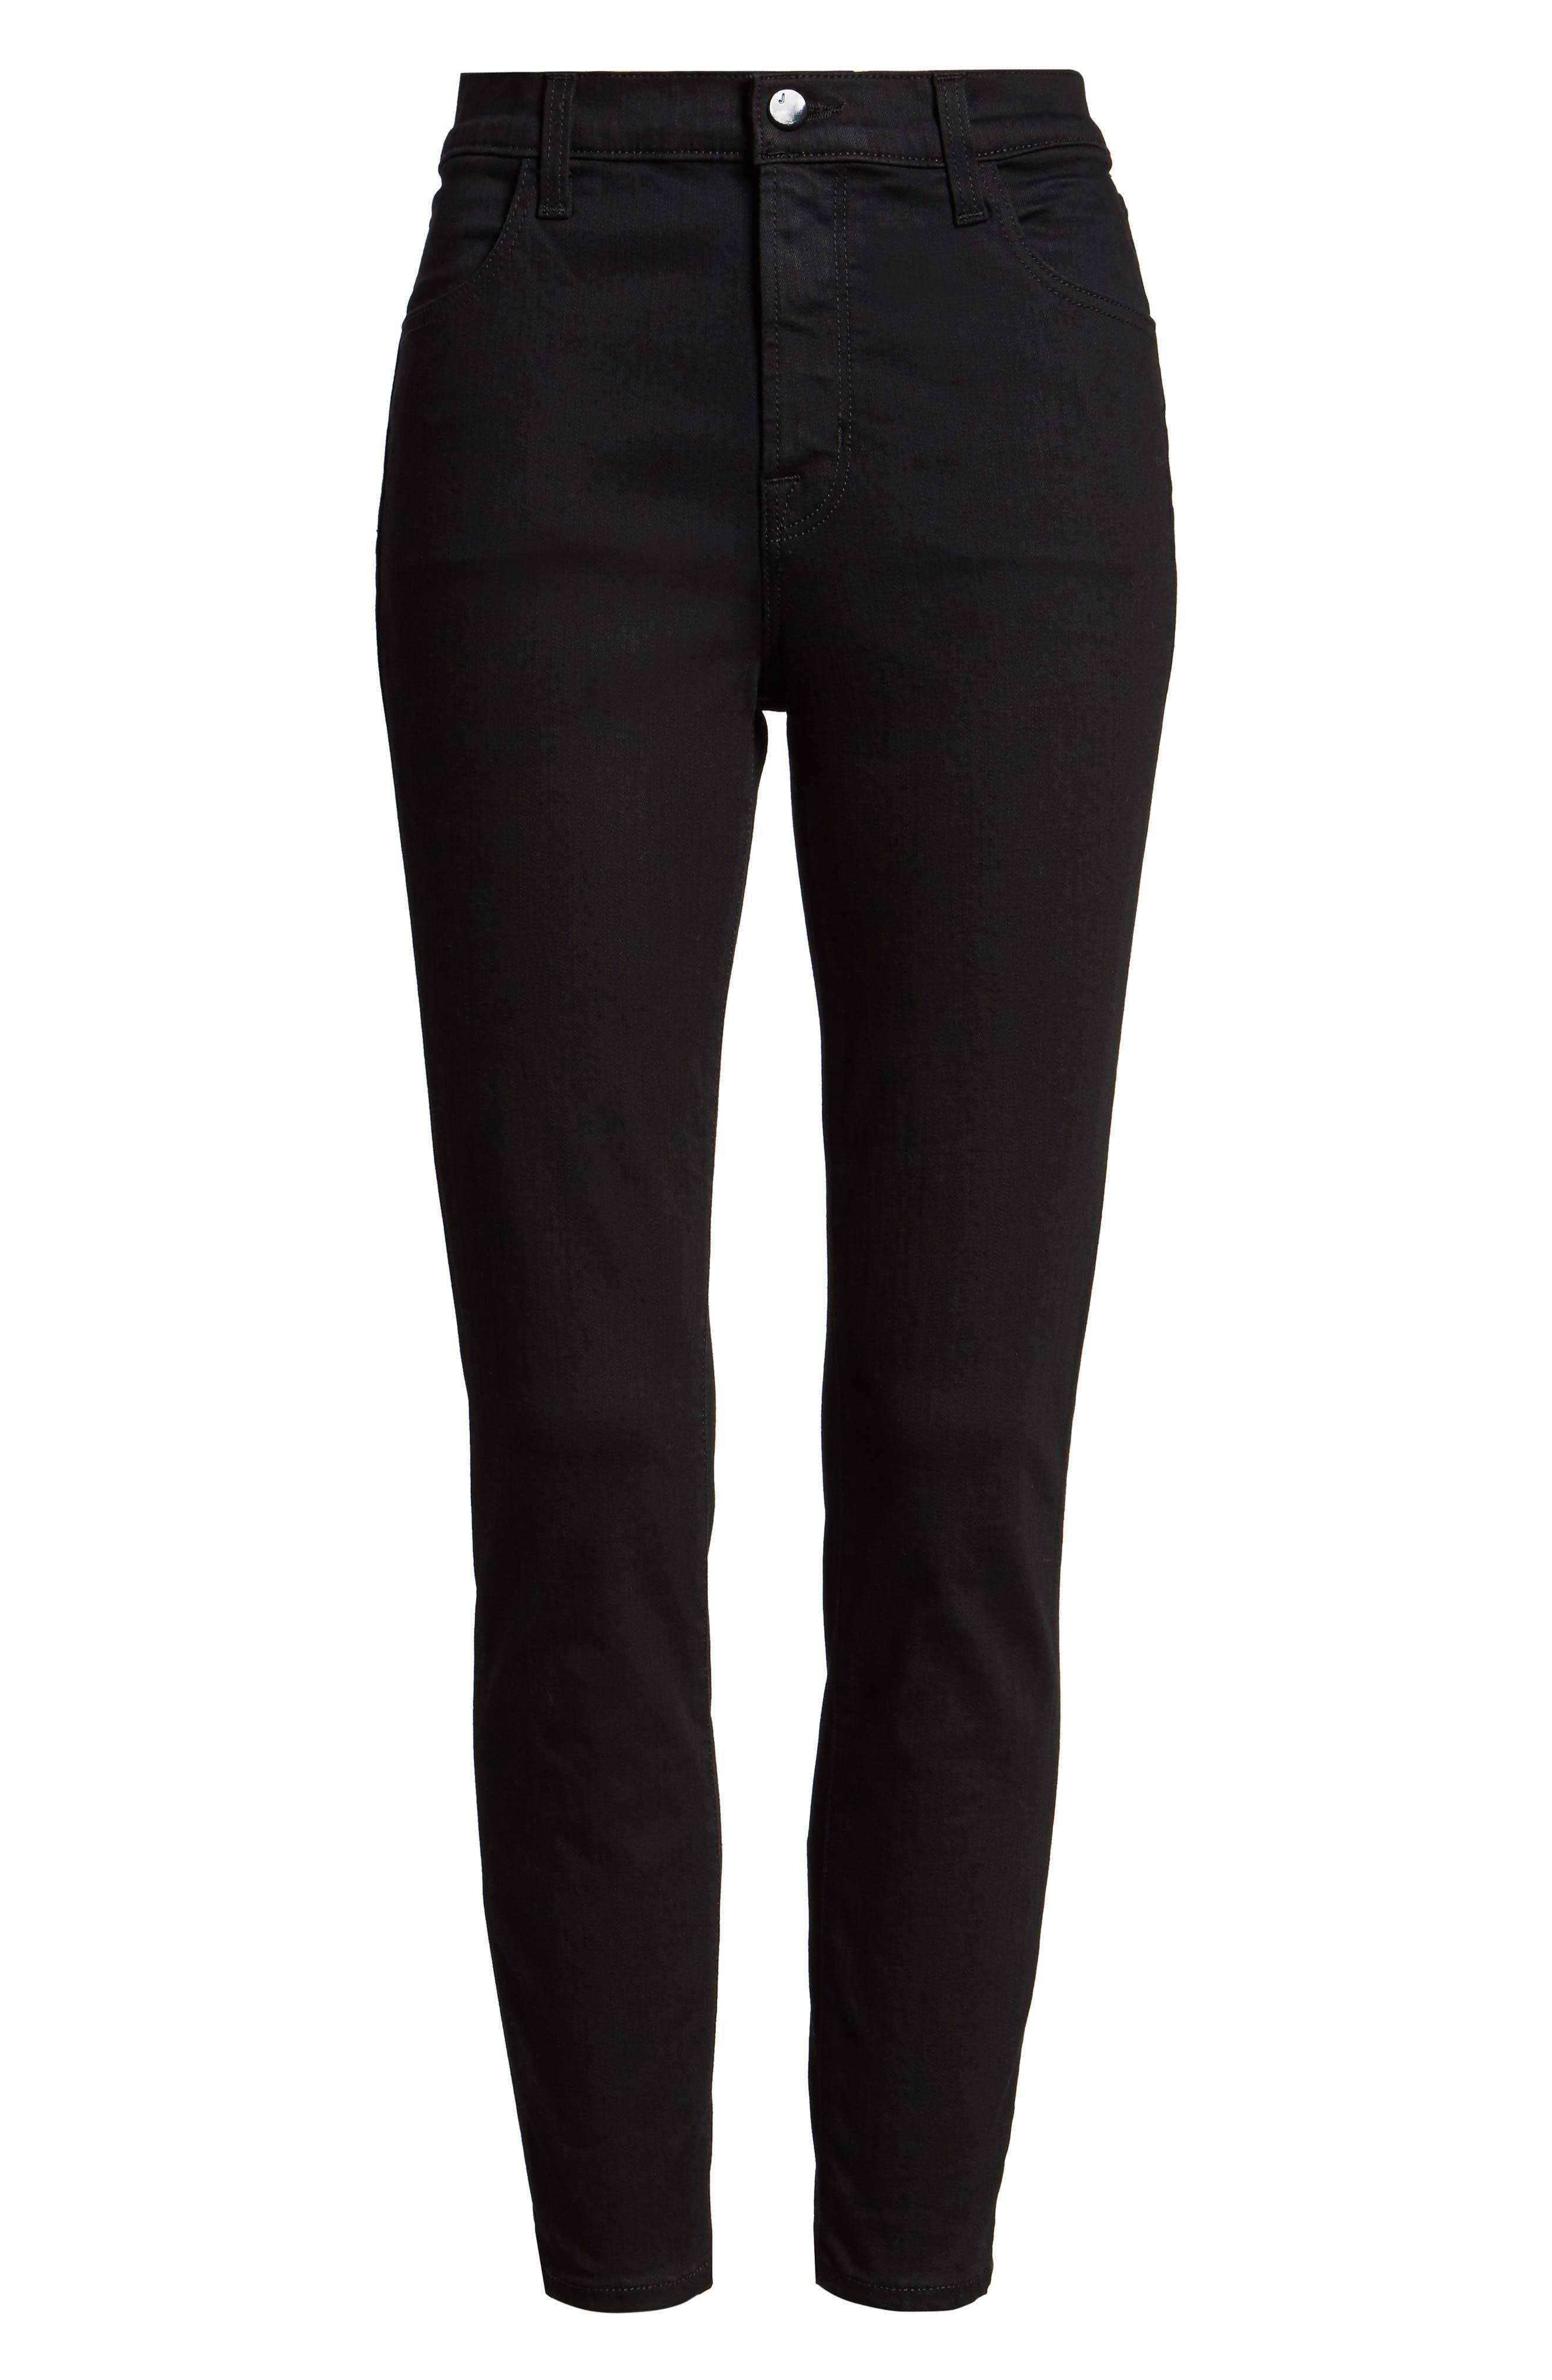 Alana High Waist Crop Skinny Jeans,                             Alternate thumbnail 6, color,                             002